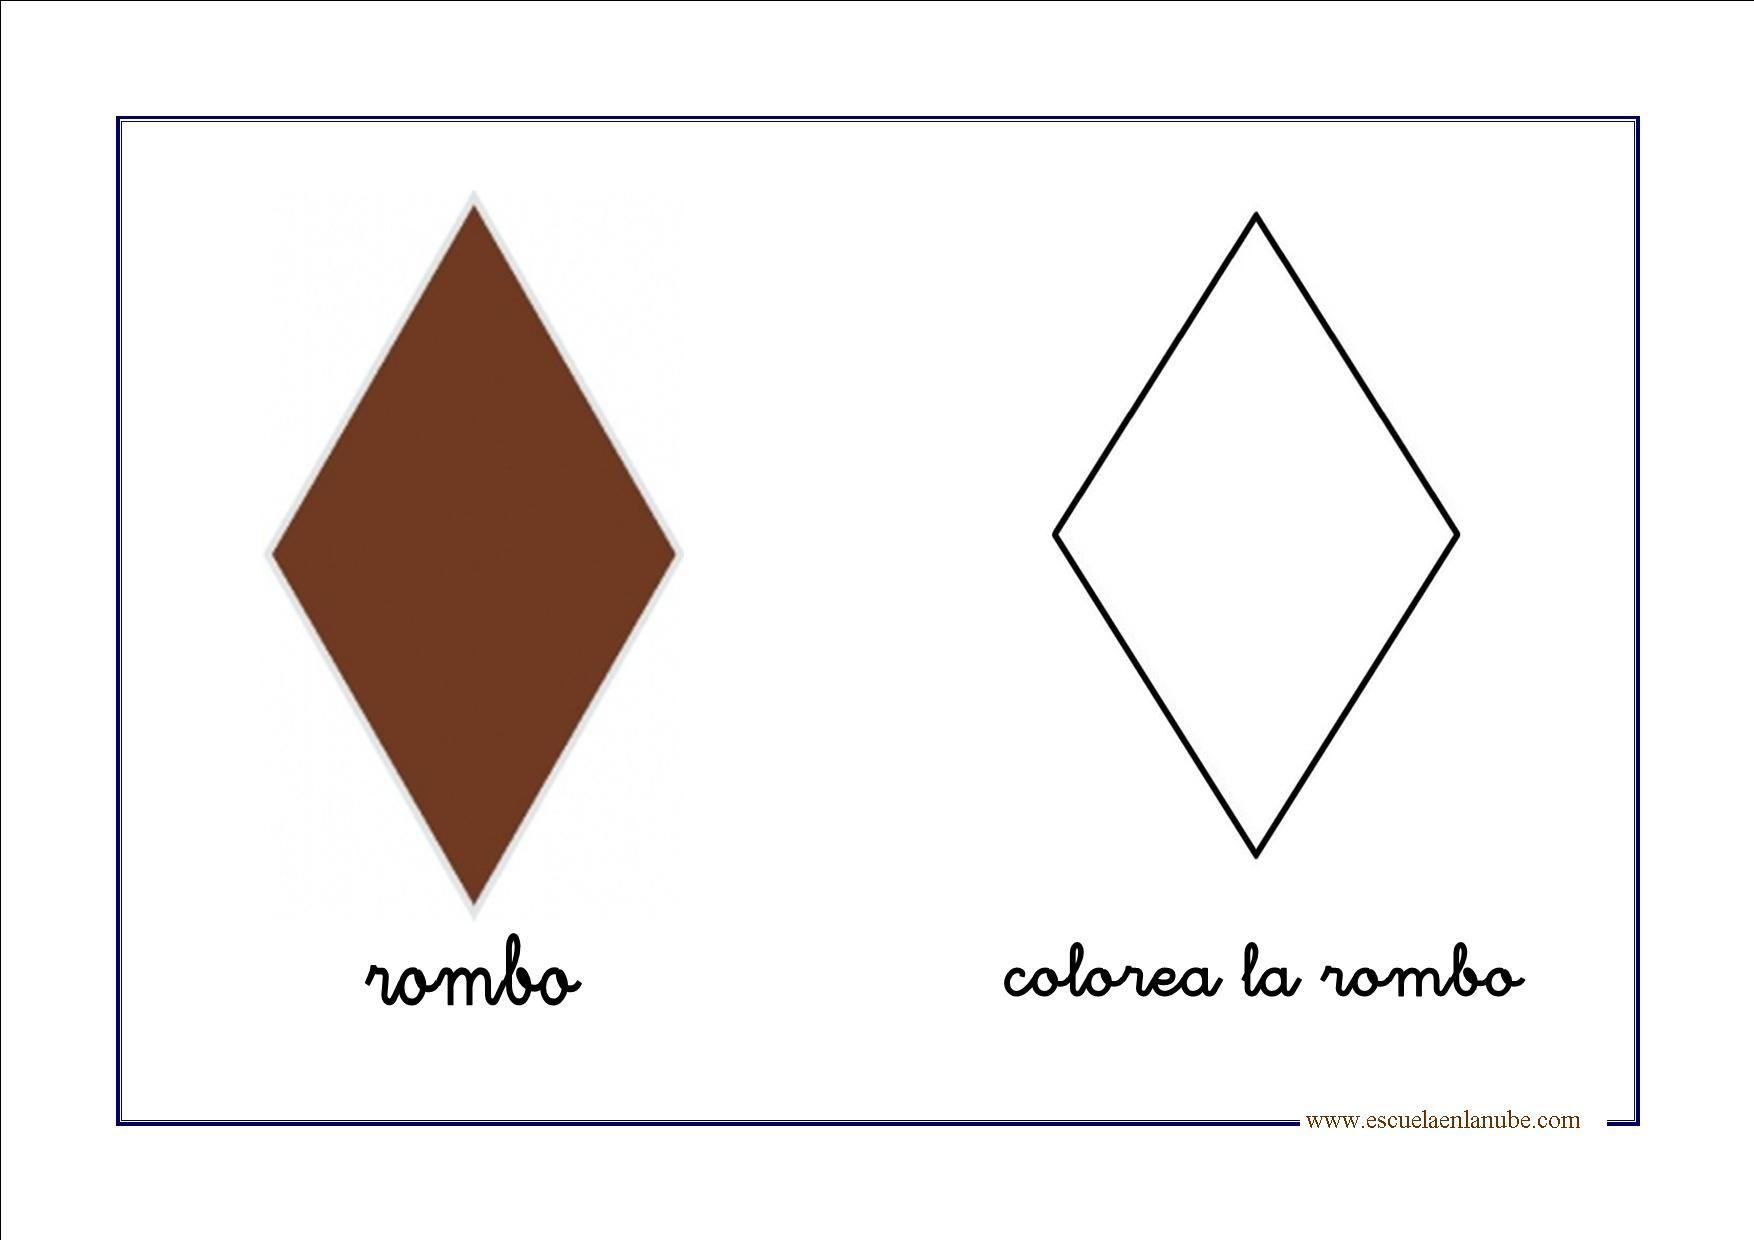 Figuras Geometricas Para Repasar En Infantil Y Primaria